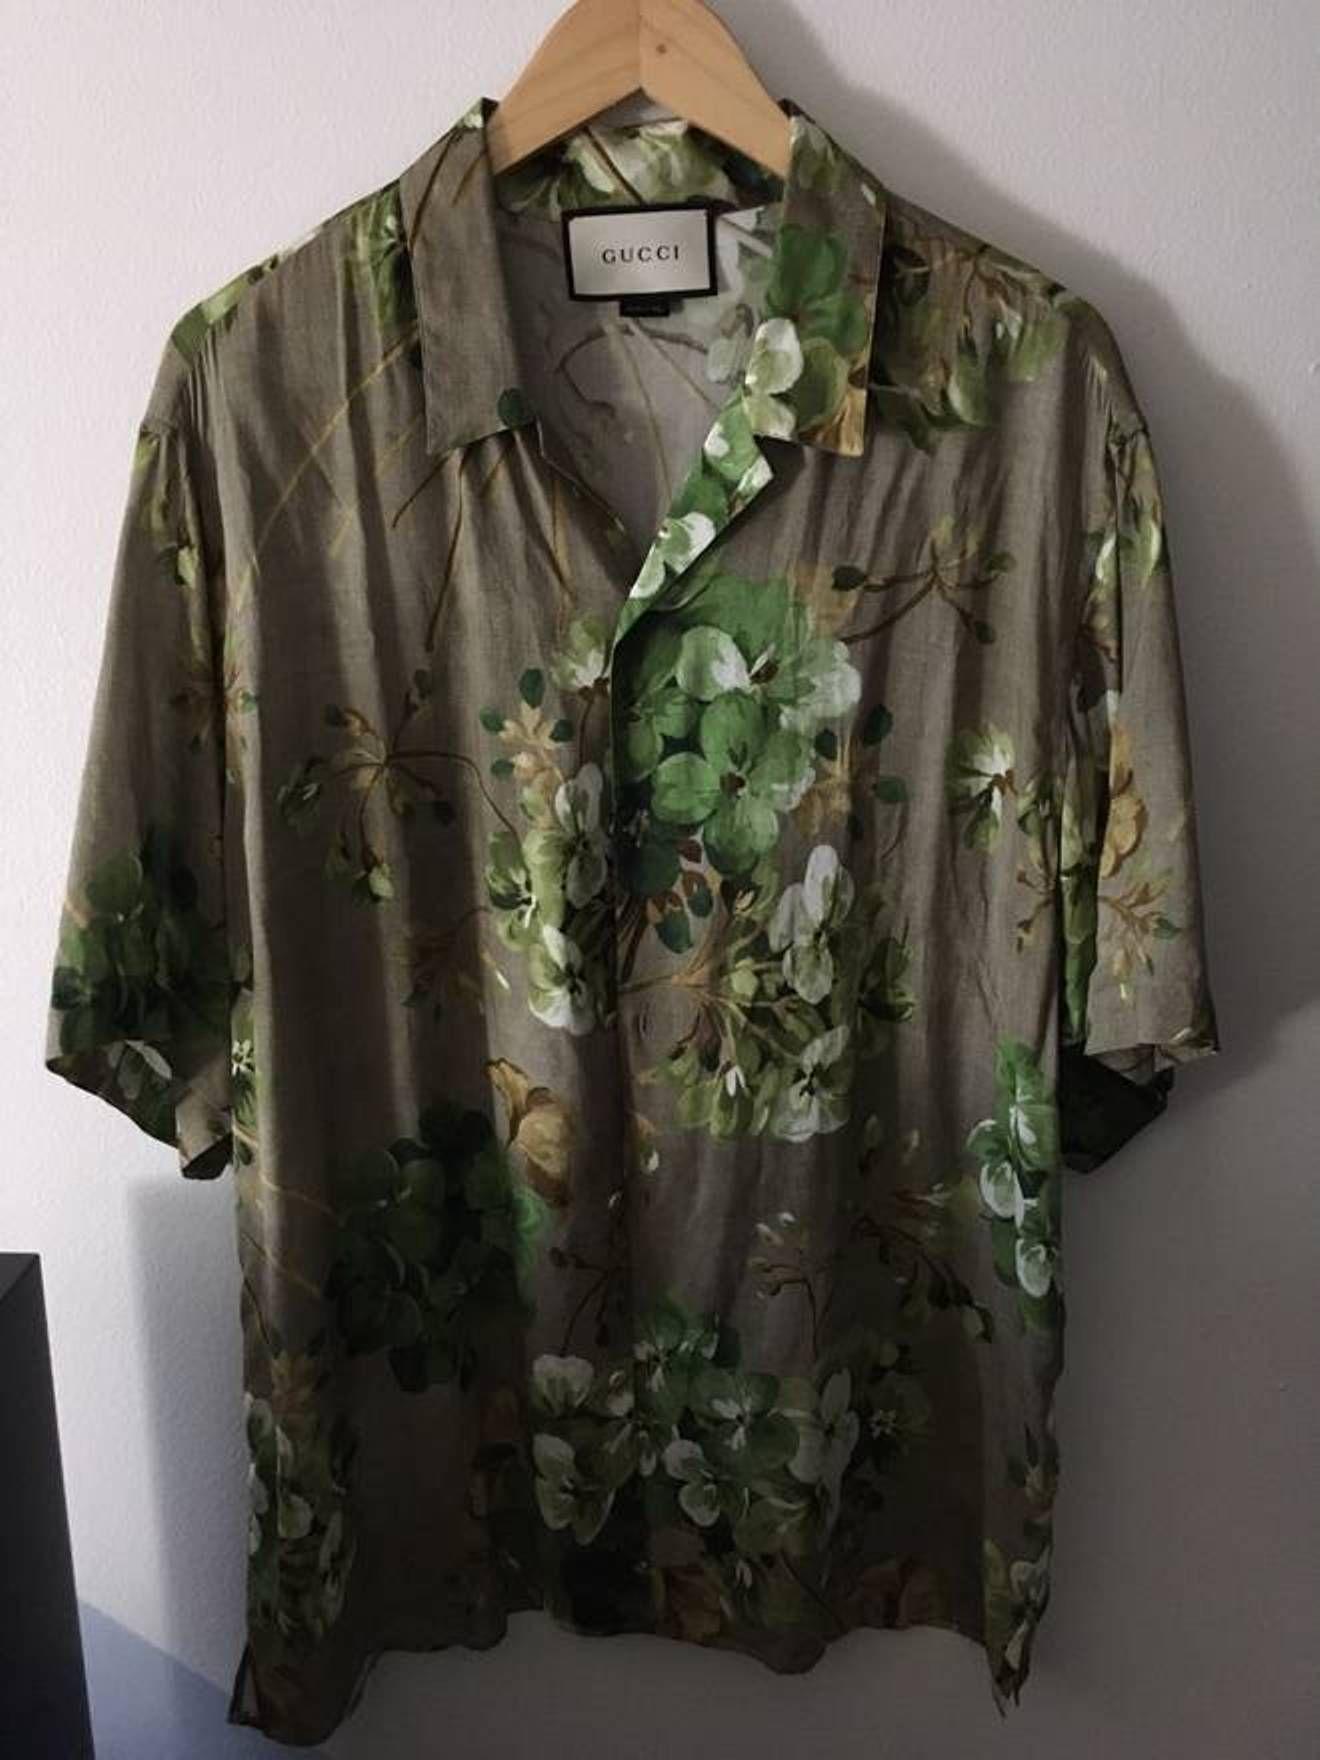 e52a0e935 S/S 16 Floral Viscose Shirt | Plagg. | Shirts, Gucci och Floral